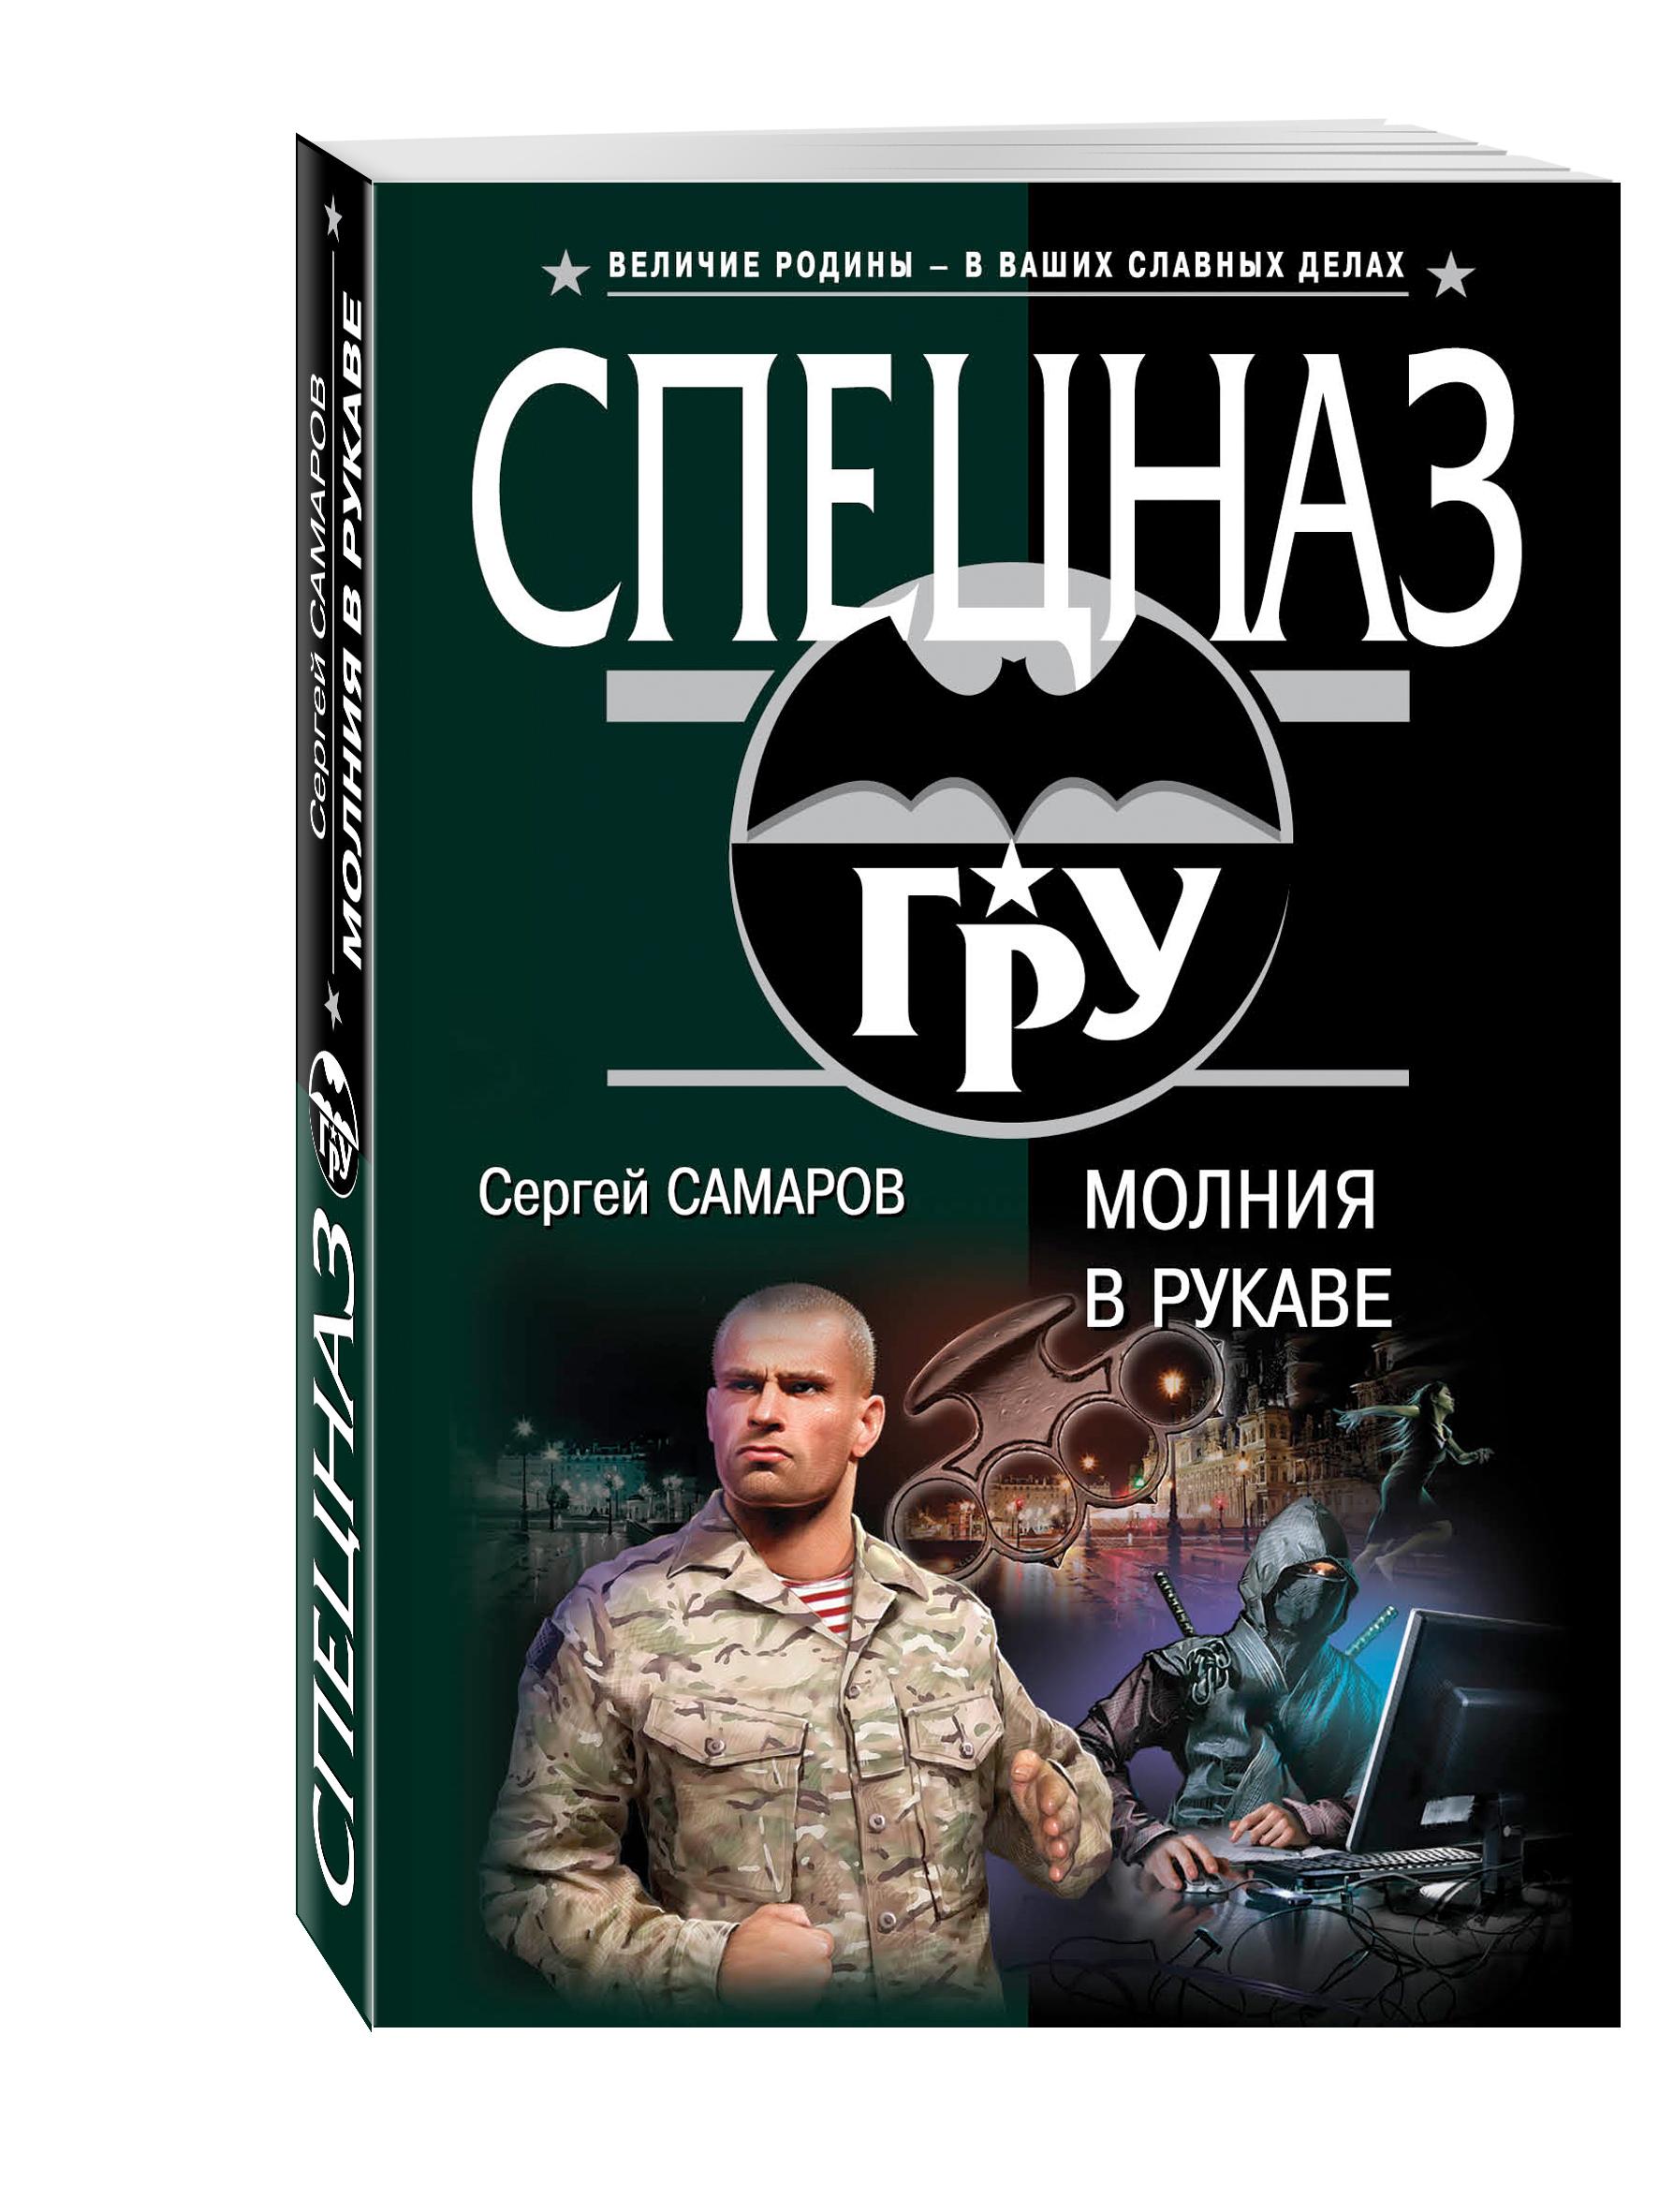 Самаров С.В. Молния в рукаве